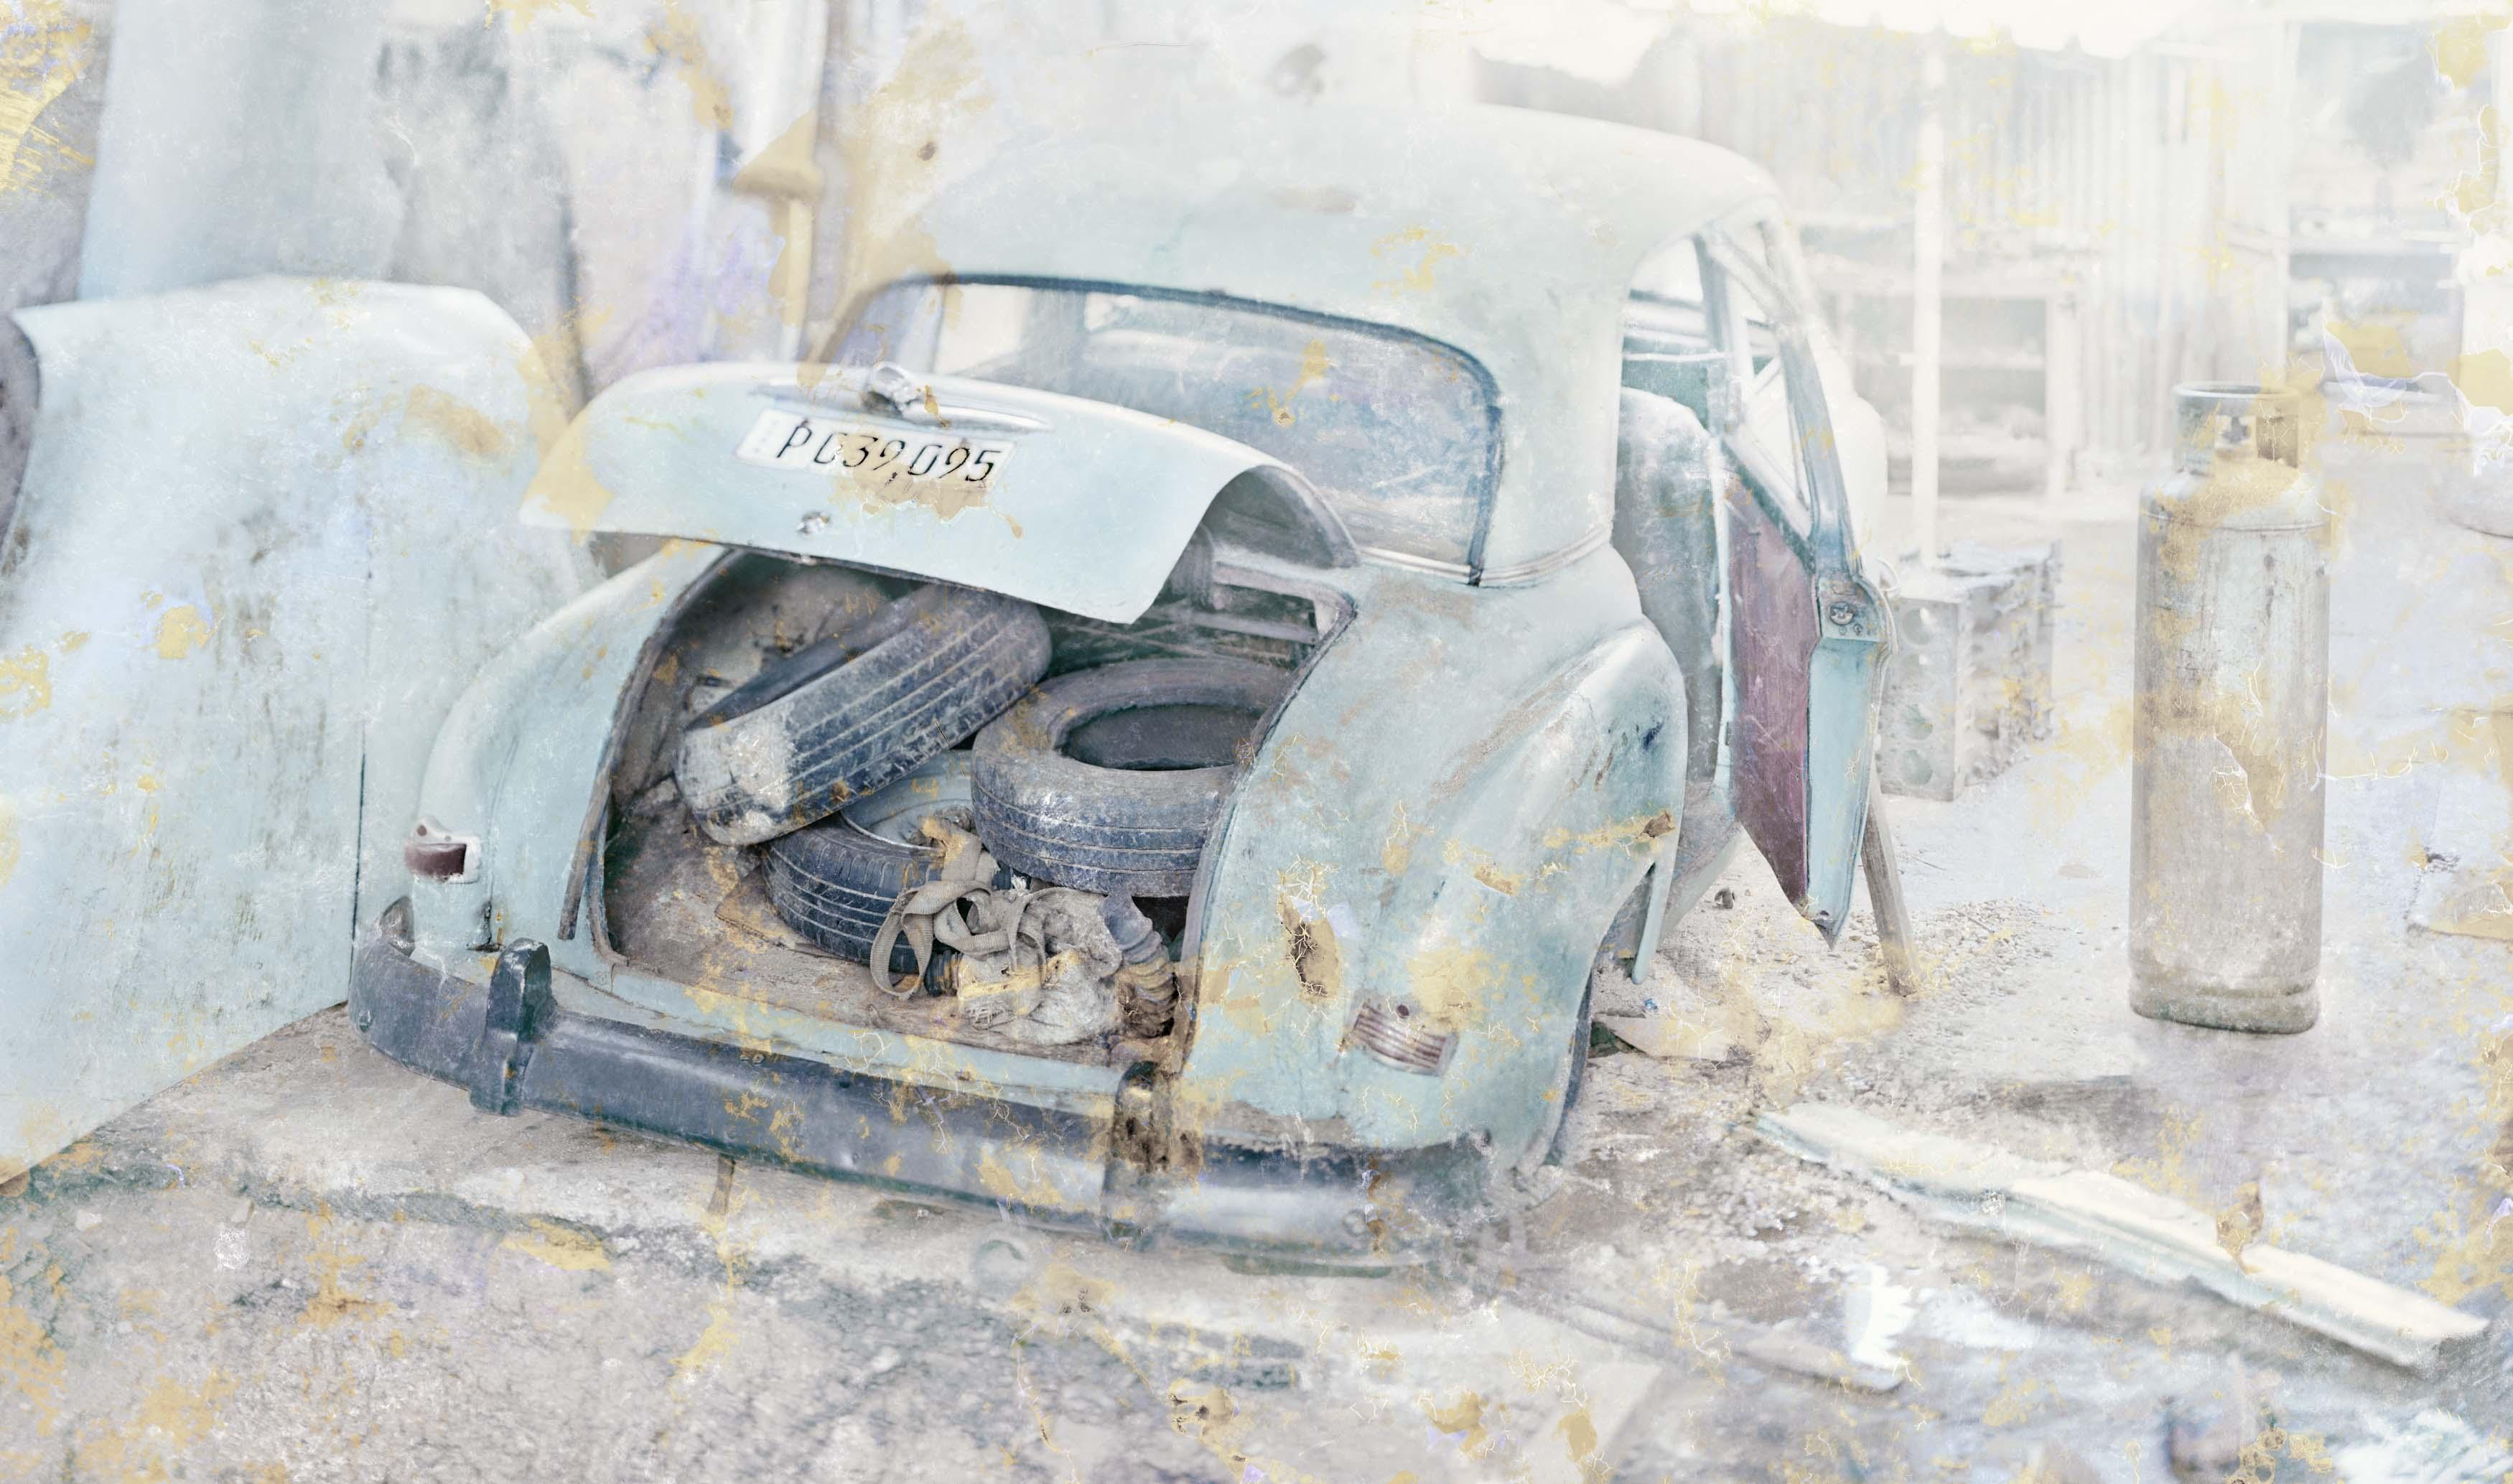 Taller de La Habana, 2016<br/>Impresión de tintas de pigmentos sobre papel  hahnemühle, montada sobre dibond de aluminio / Inkjet print on hannemühle paper mounted on aluminum dibond